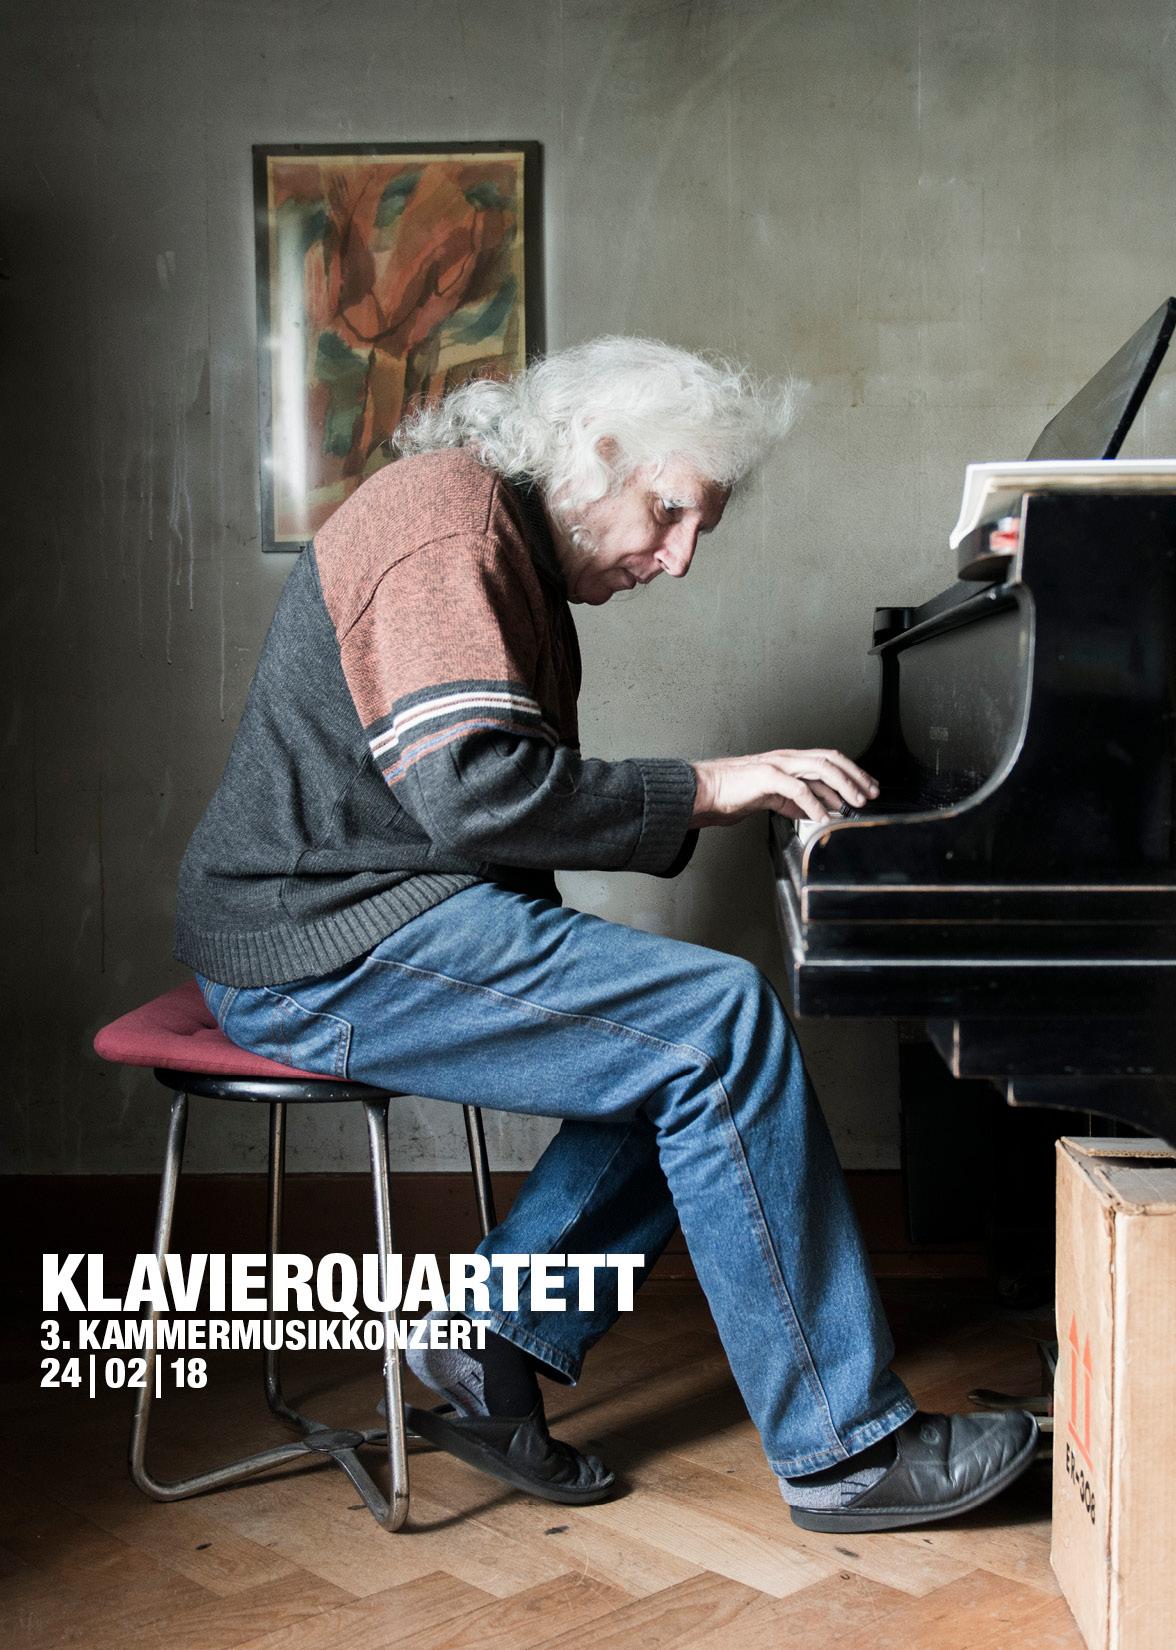 Klavierquartett